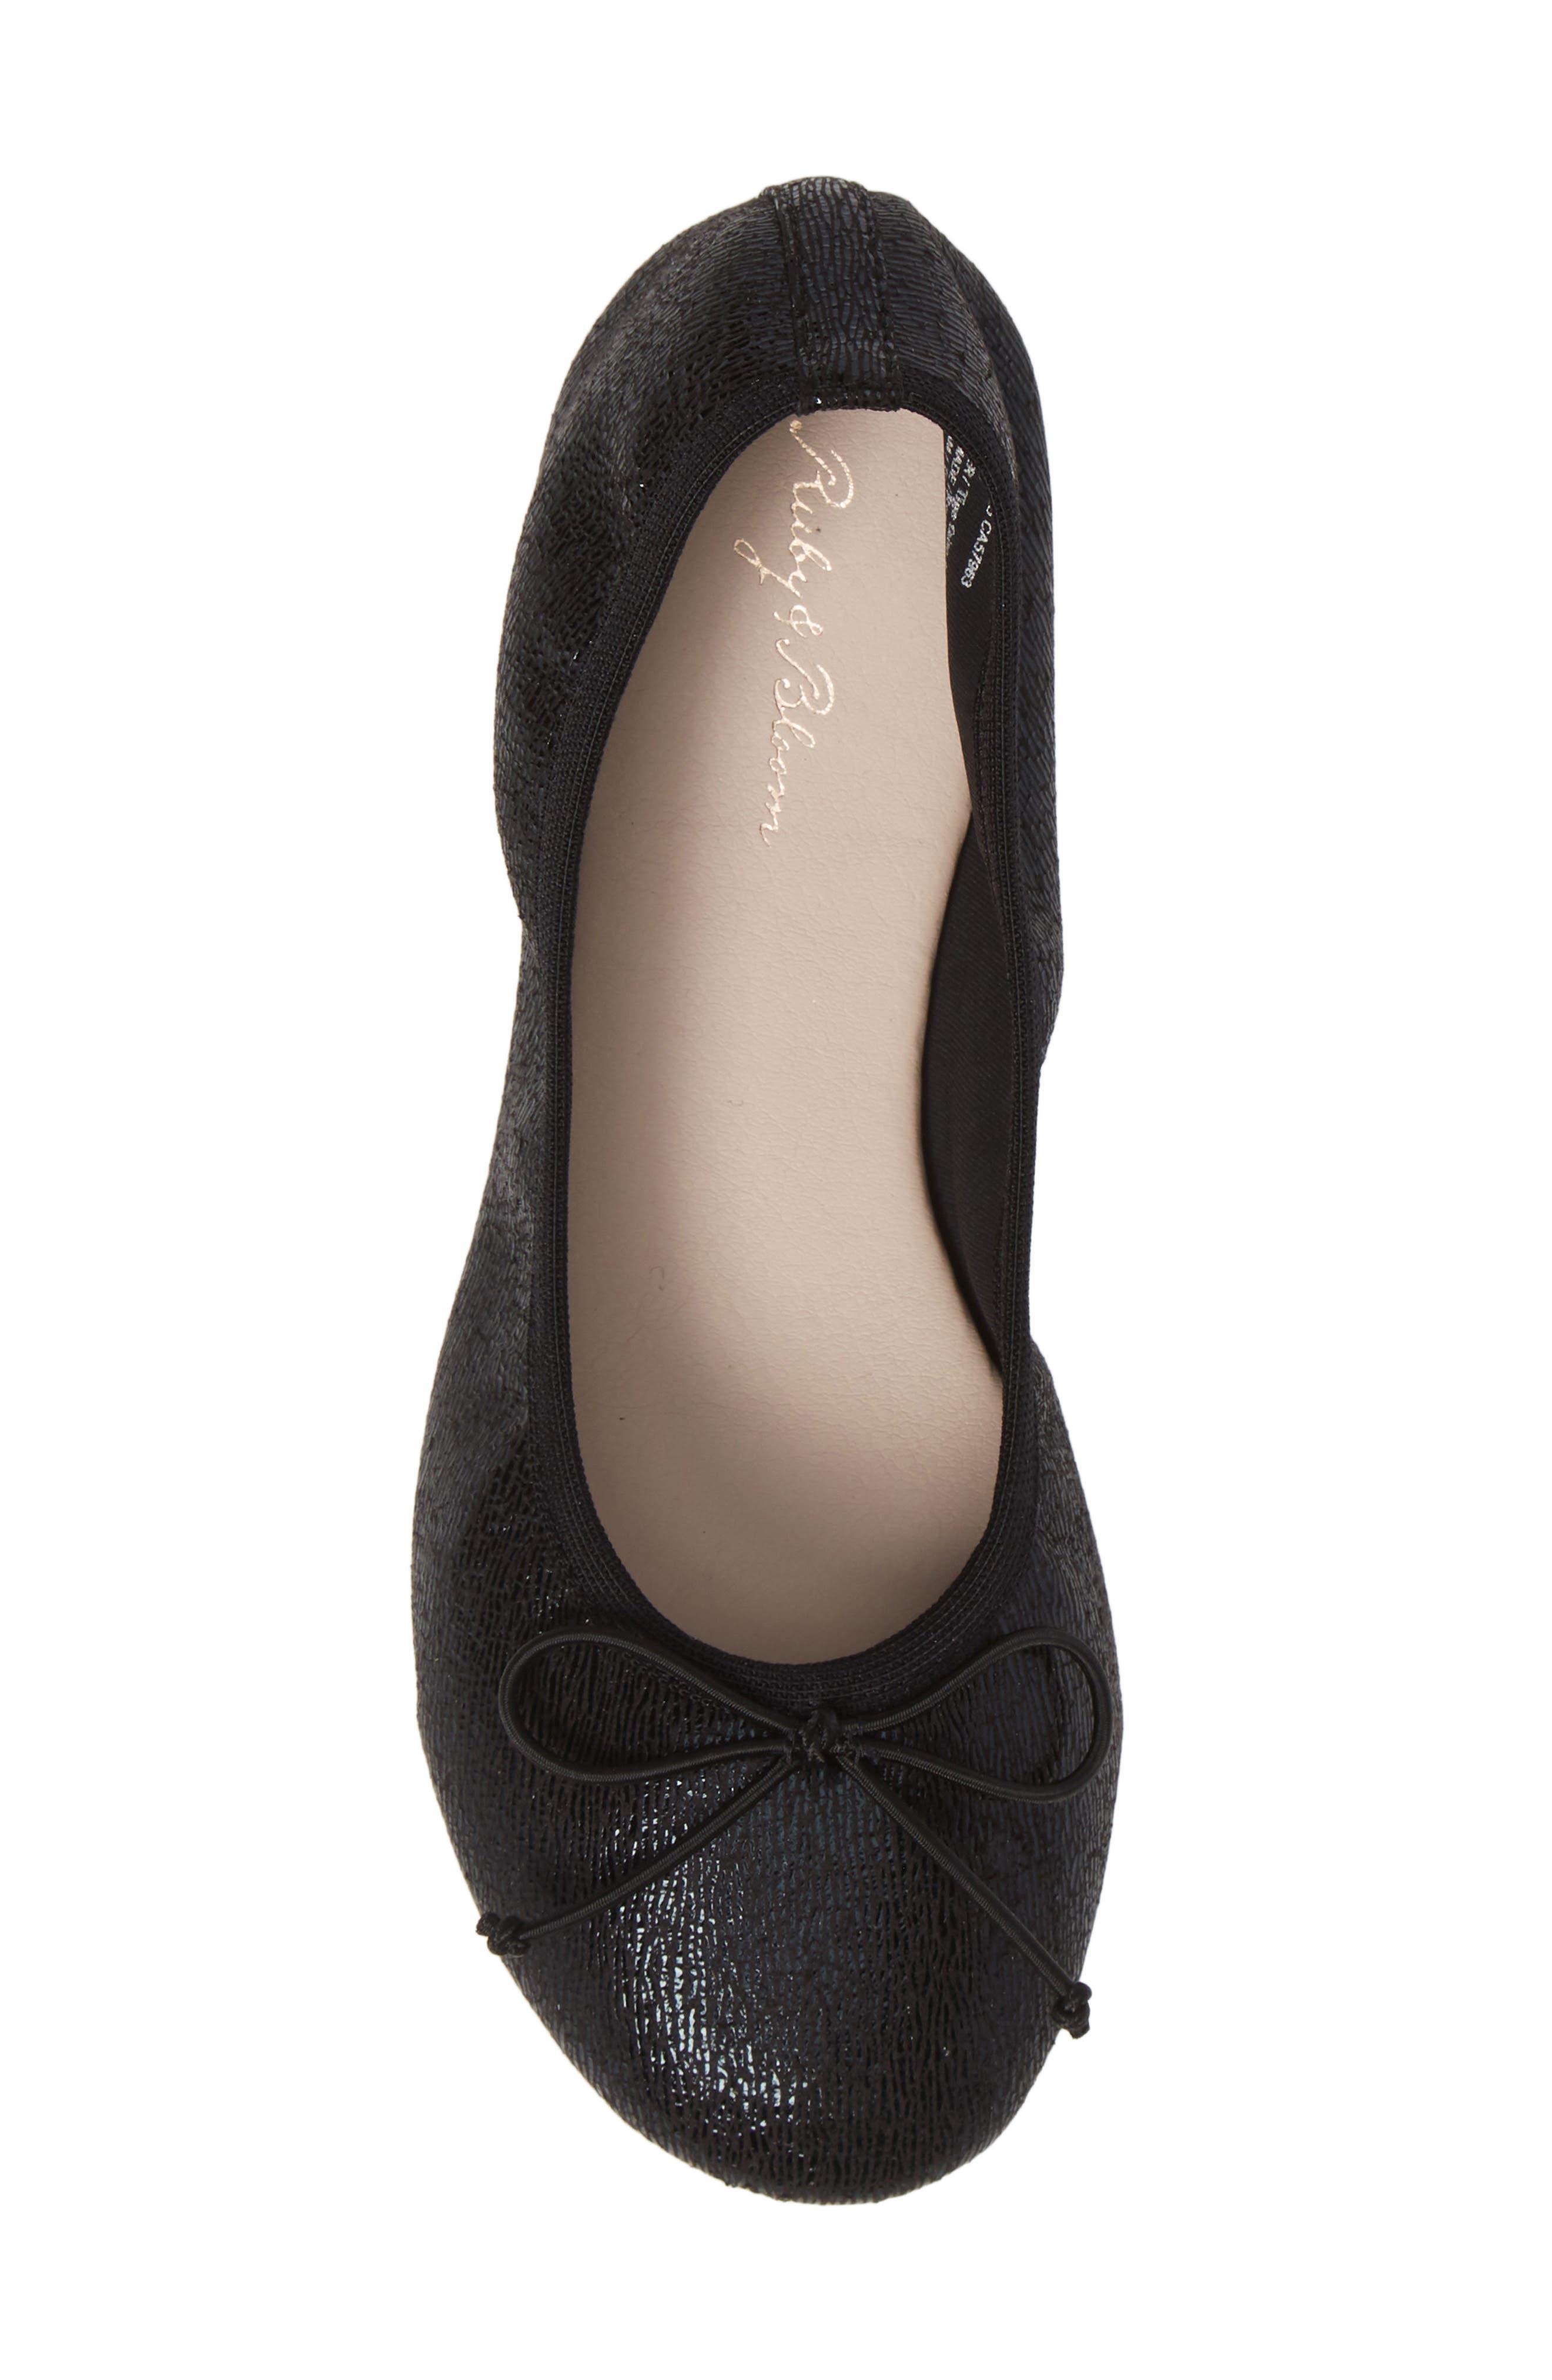 Bella Ballet Flat,                             Alternate thumbnail 5, color,                             BLACK SHIMMER FAUX LEATHER